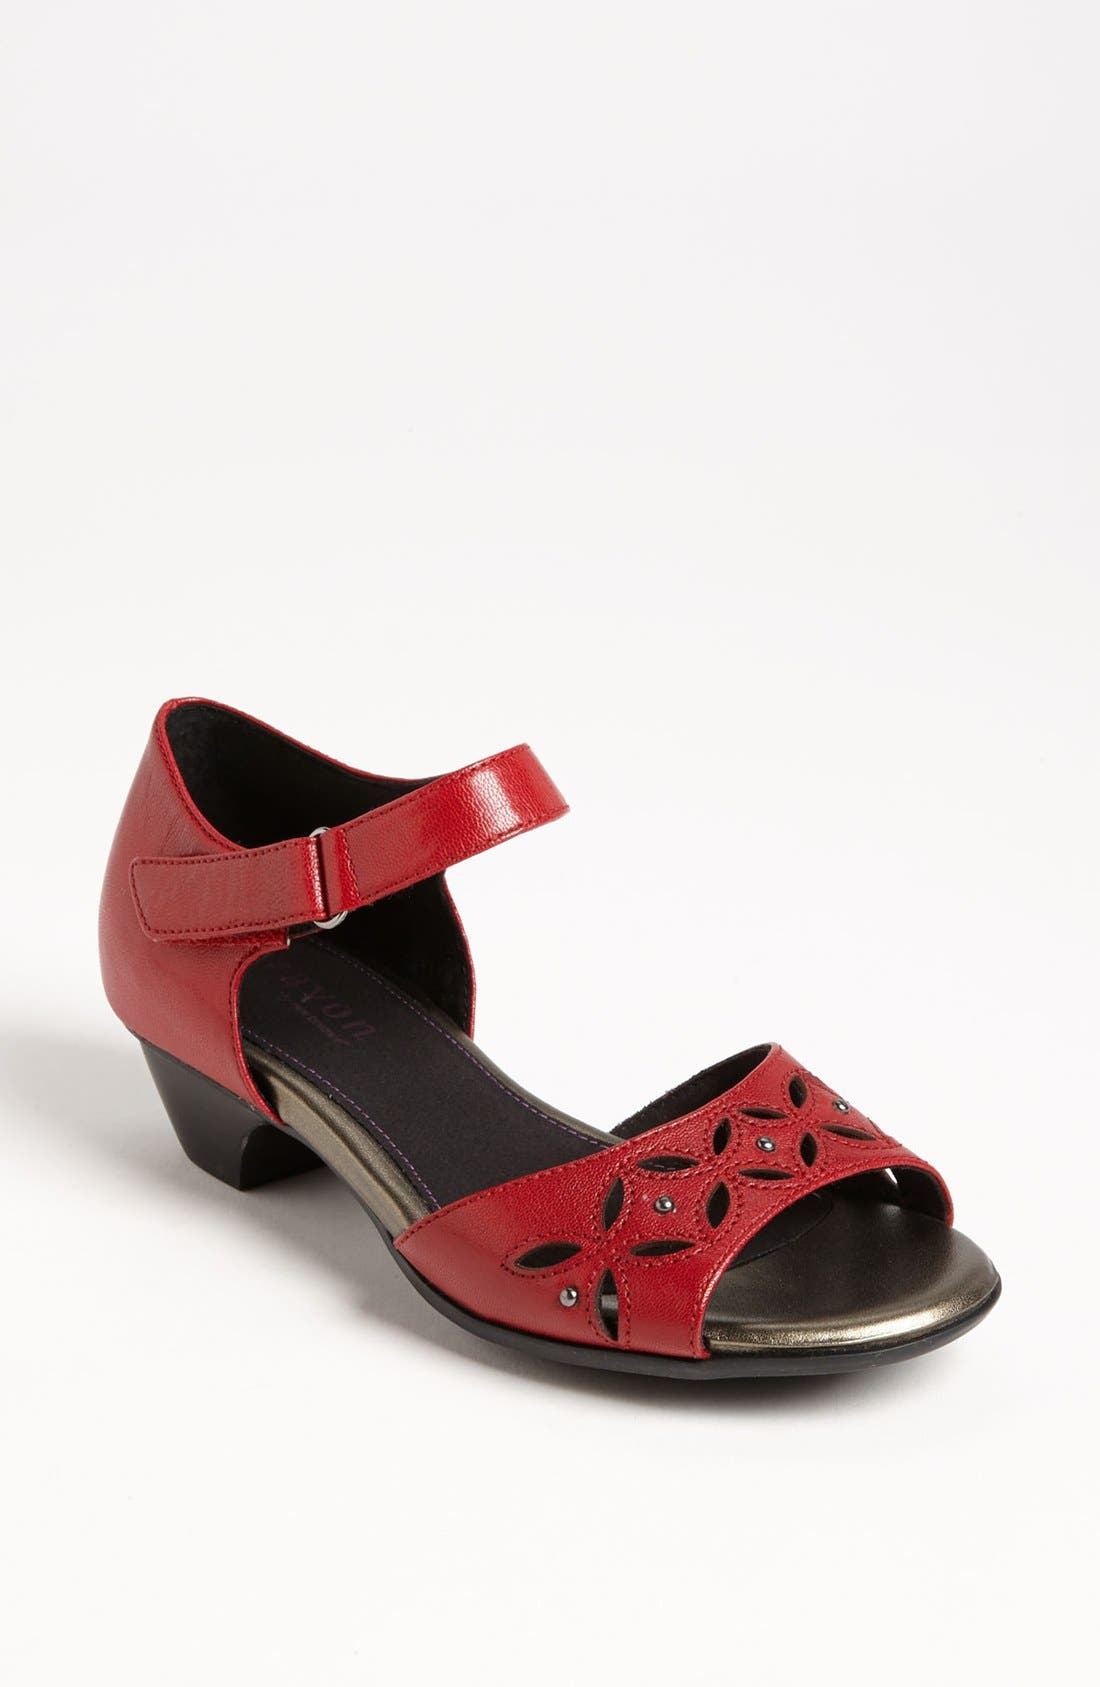 Alternate Image 1 Selected - Aravon 'Sofia' Sandal